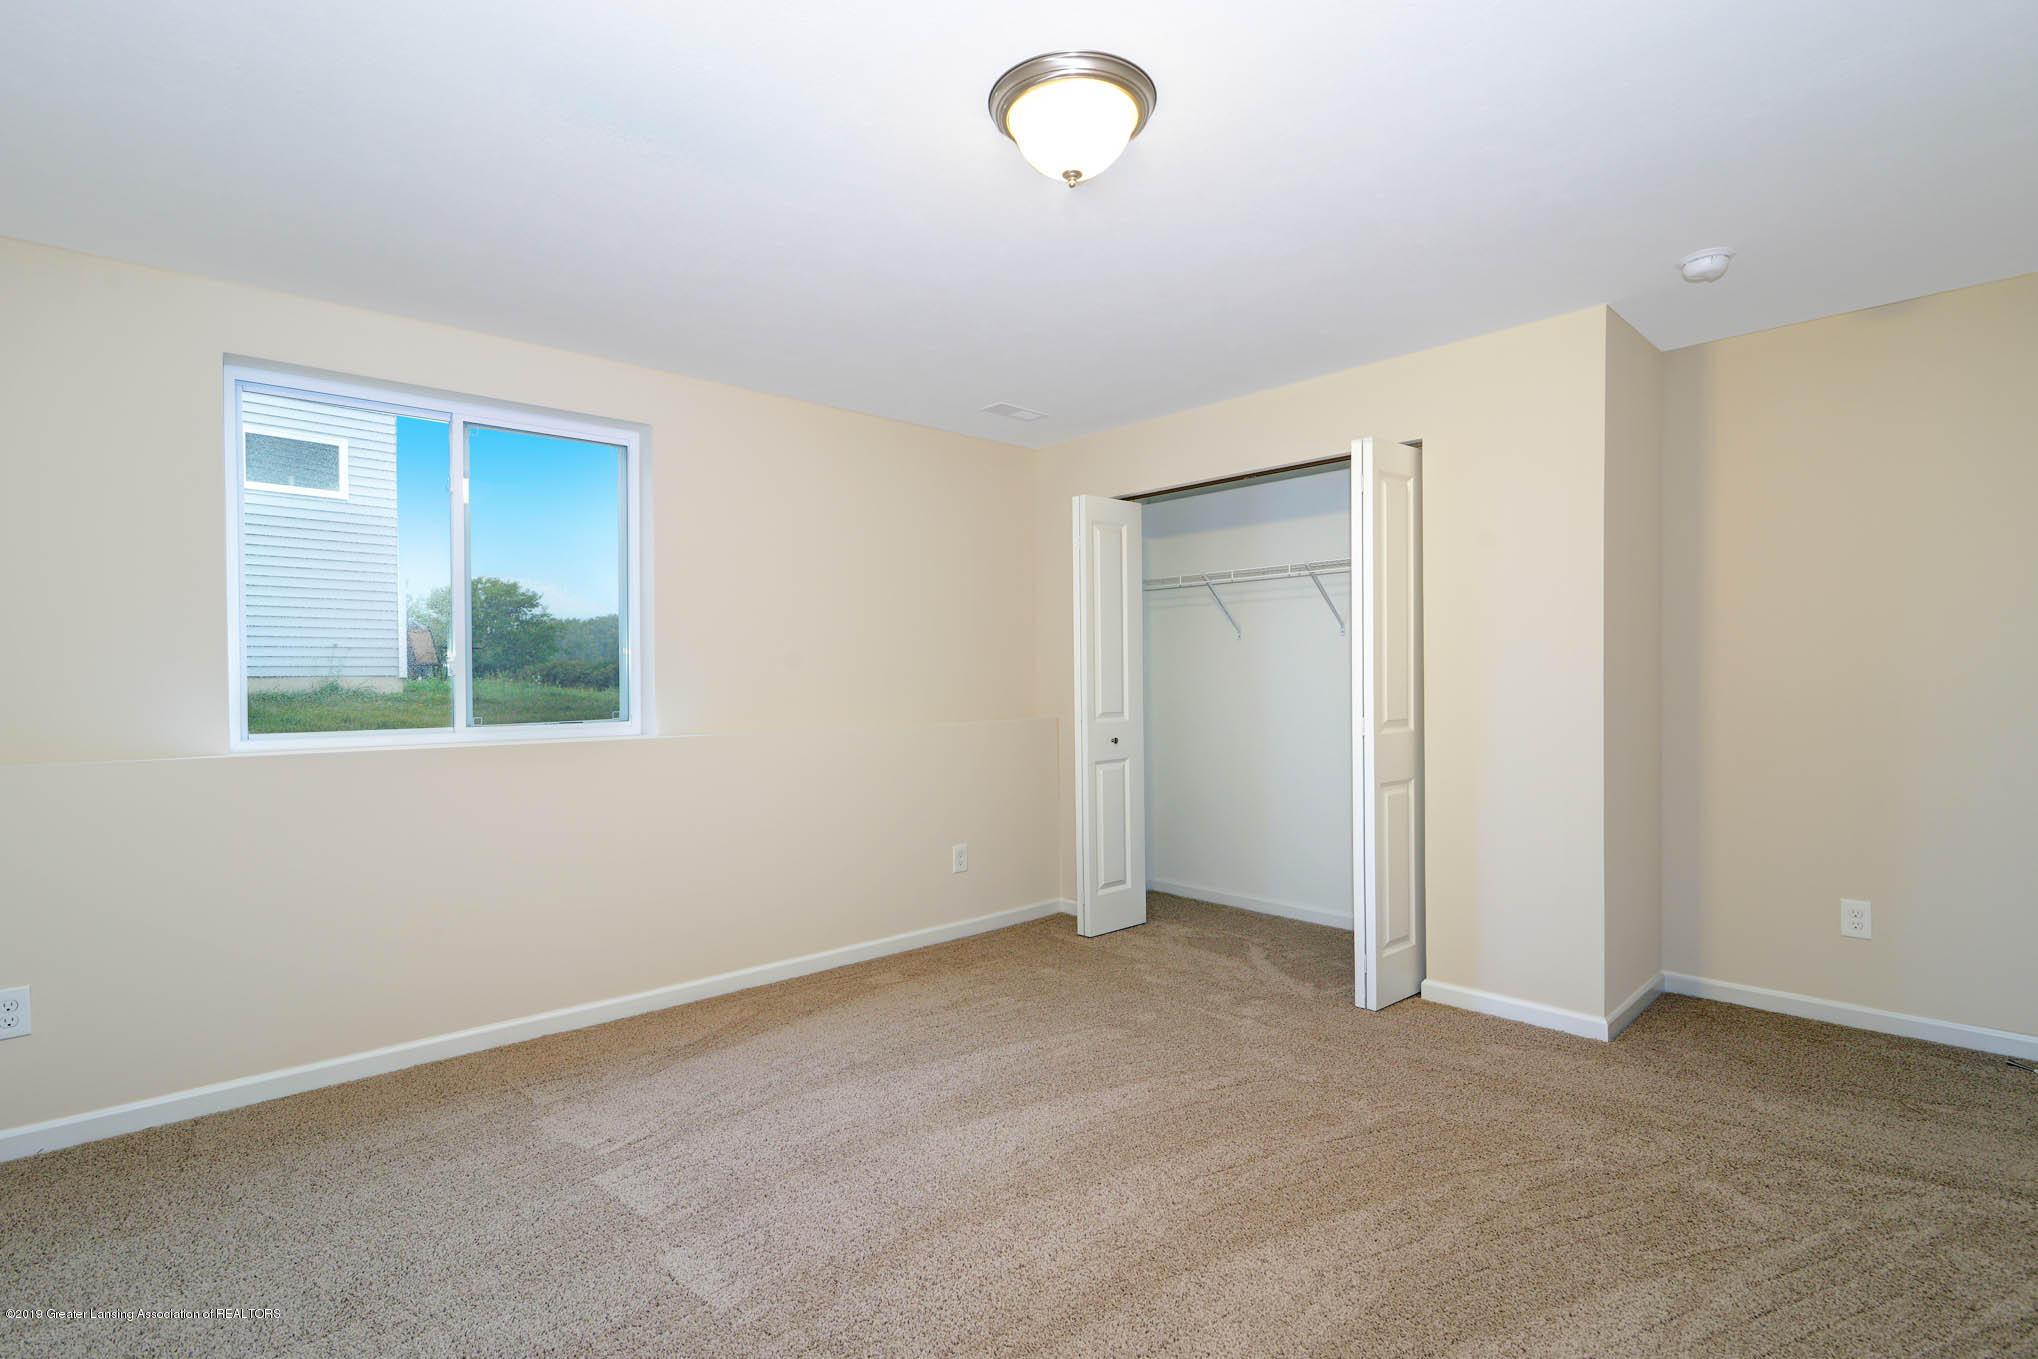 3532 Fernwood Ln - GDN069-C2040-Bed 3 - 11